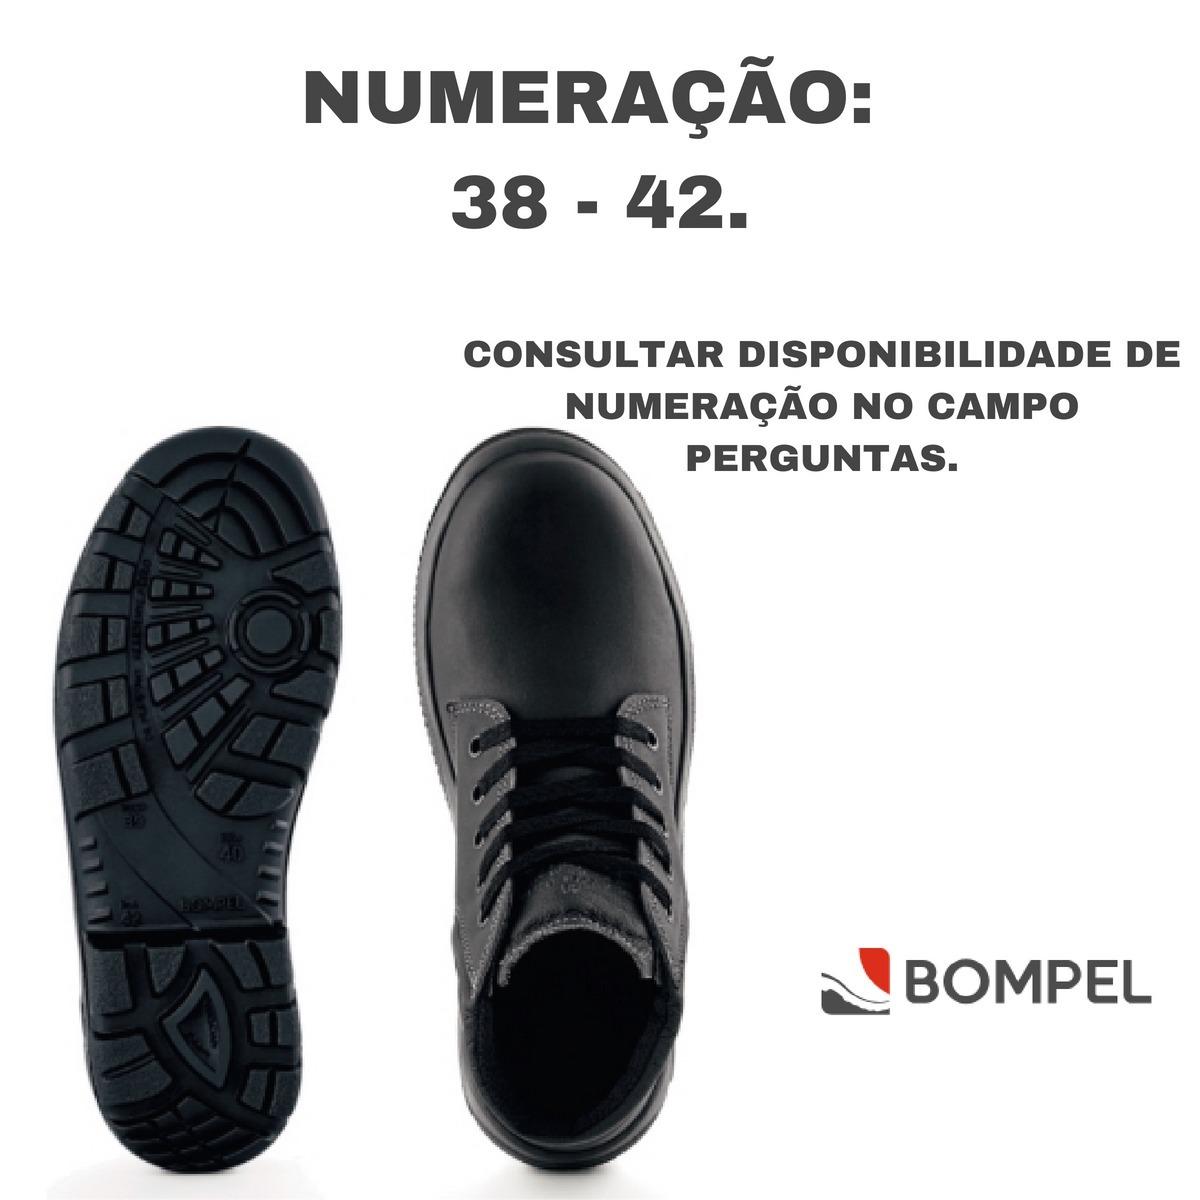 fefa22267ae6d Botina Ocupacional Convencional Sem Biqueira Bompel - R  520,99 em ...